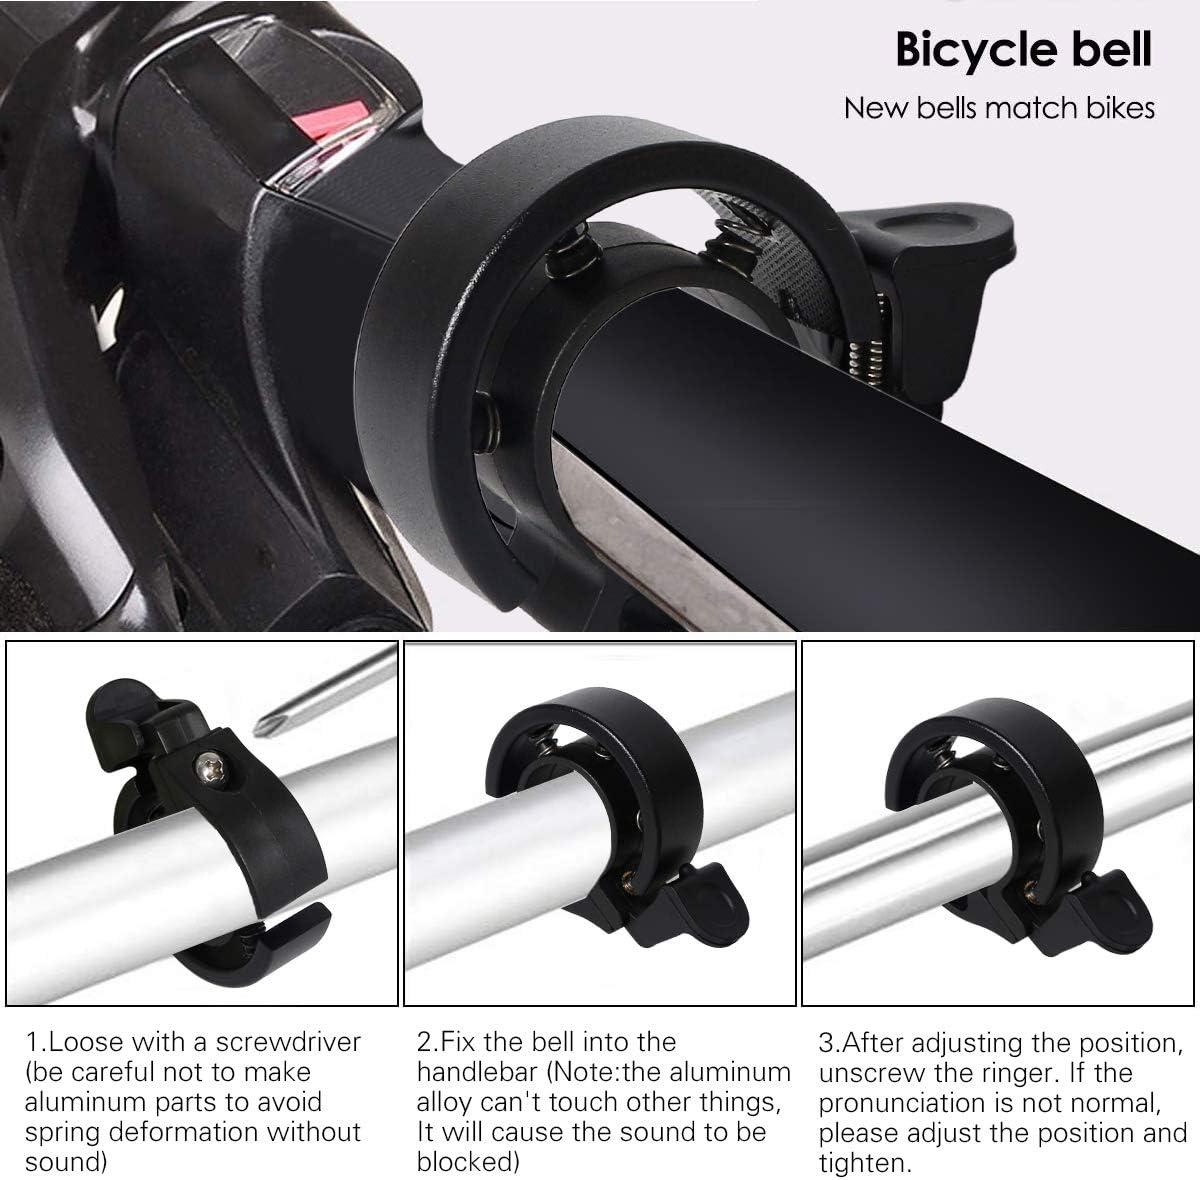 Cevikno 2 Pack Mini Fahrradklingel Fahrradlenkring Klingel Sicherheitswarnung Fahrrad Glocke laut und hell